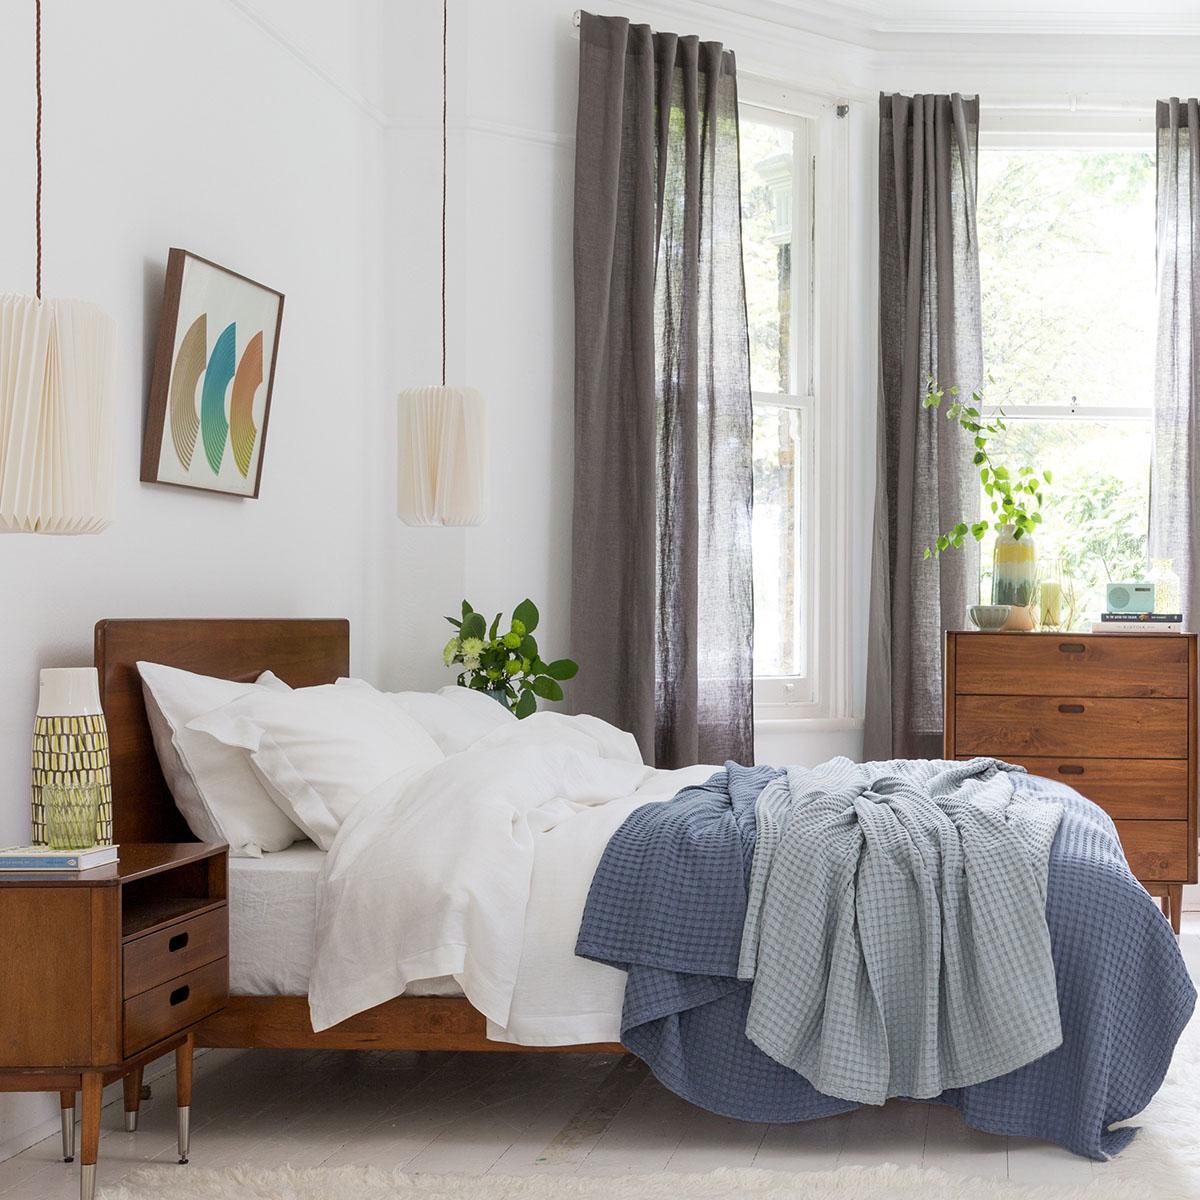 White French Linen Bedding